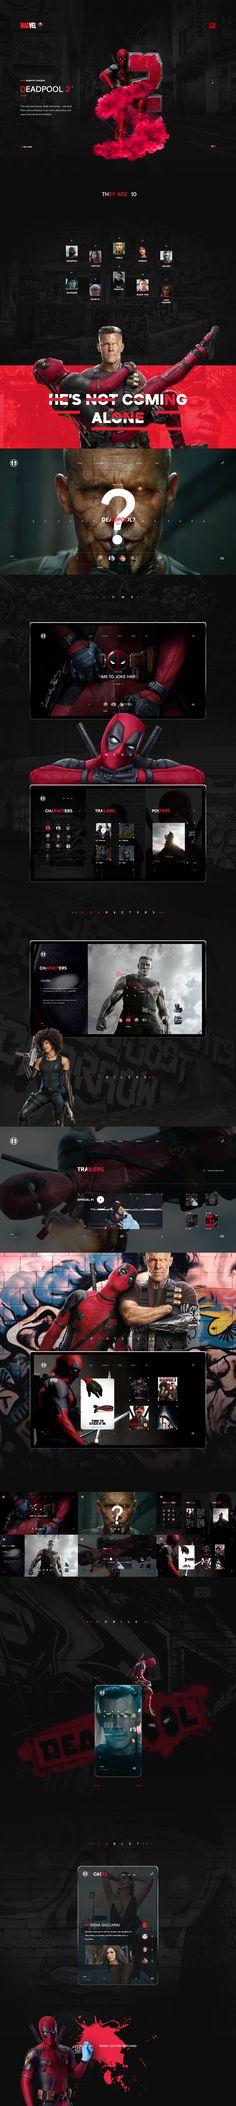 Deadpool 2- mini website on Behance